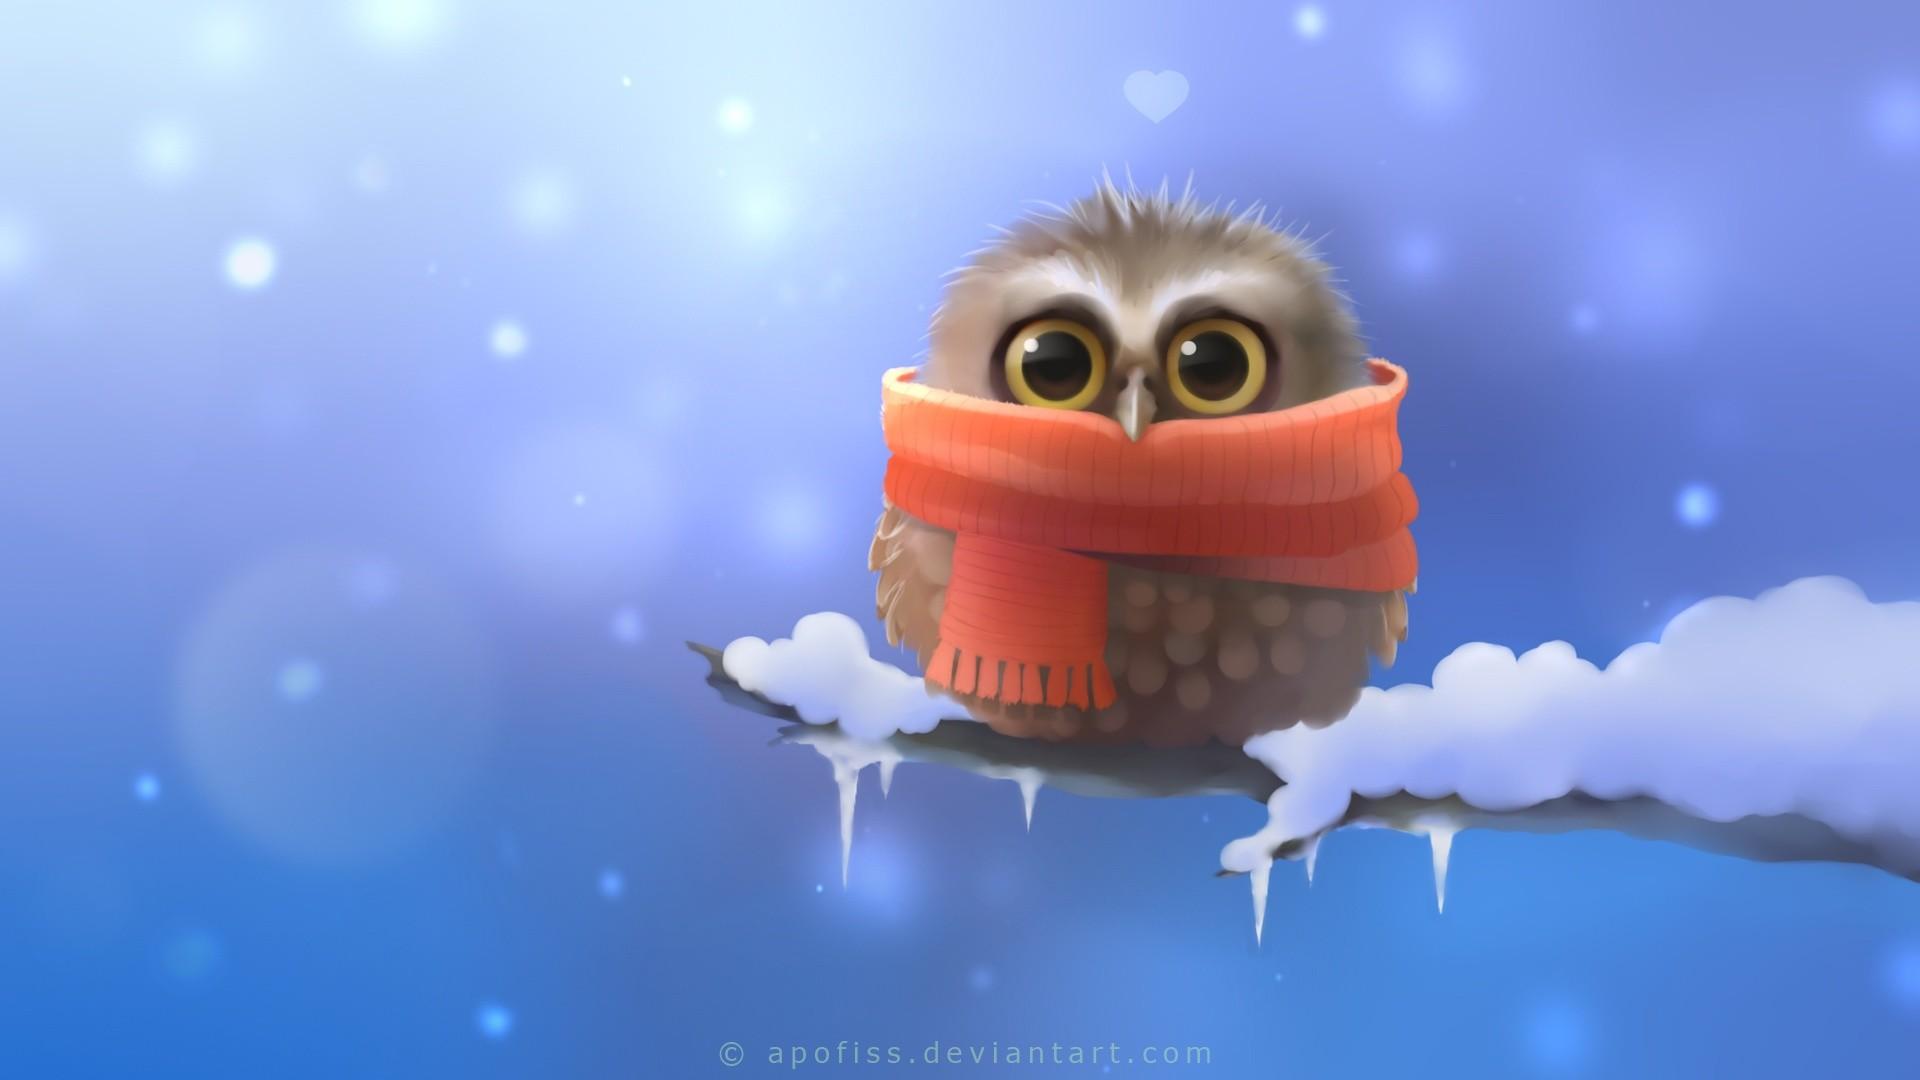 Cute Owl Wallpapers | HD Wallpapers